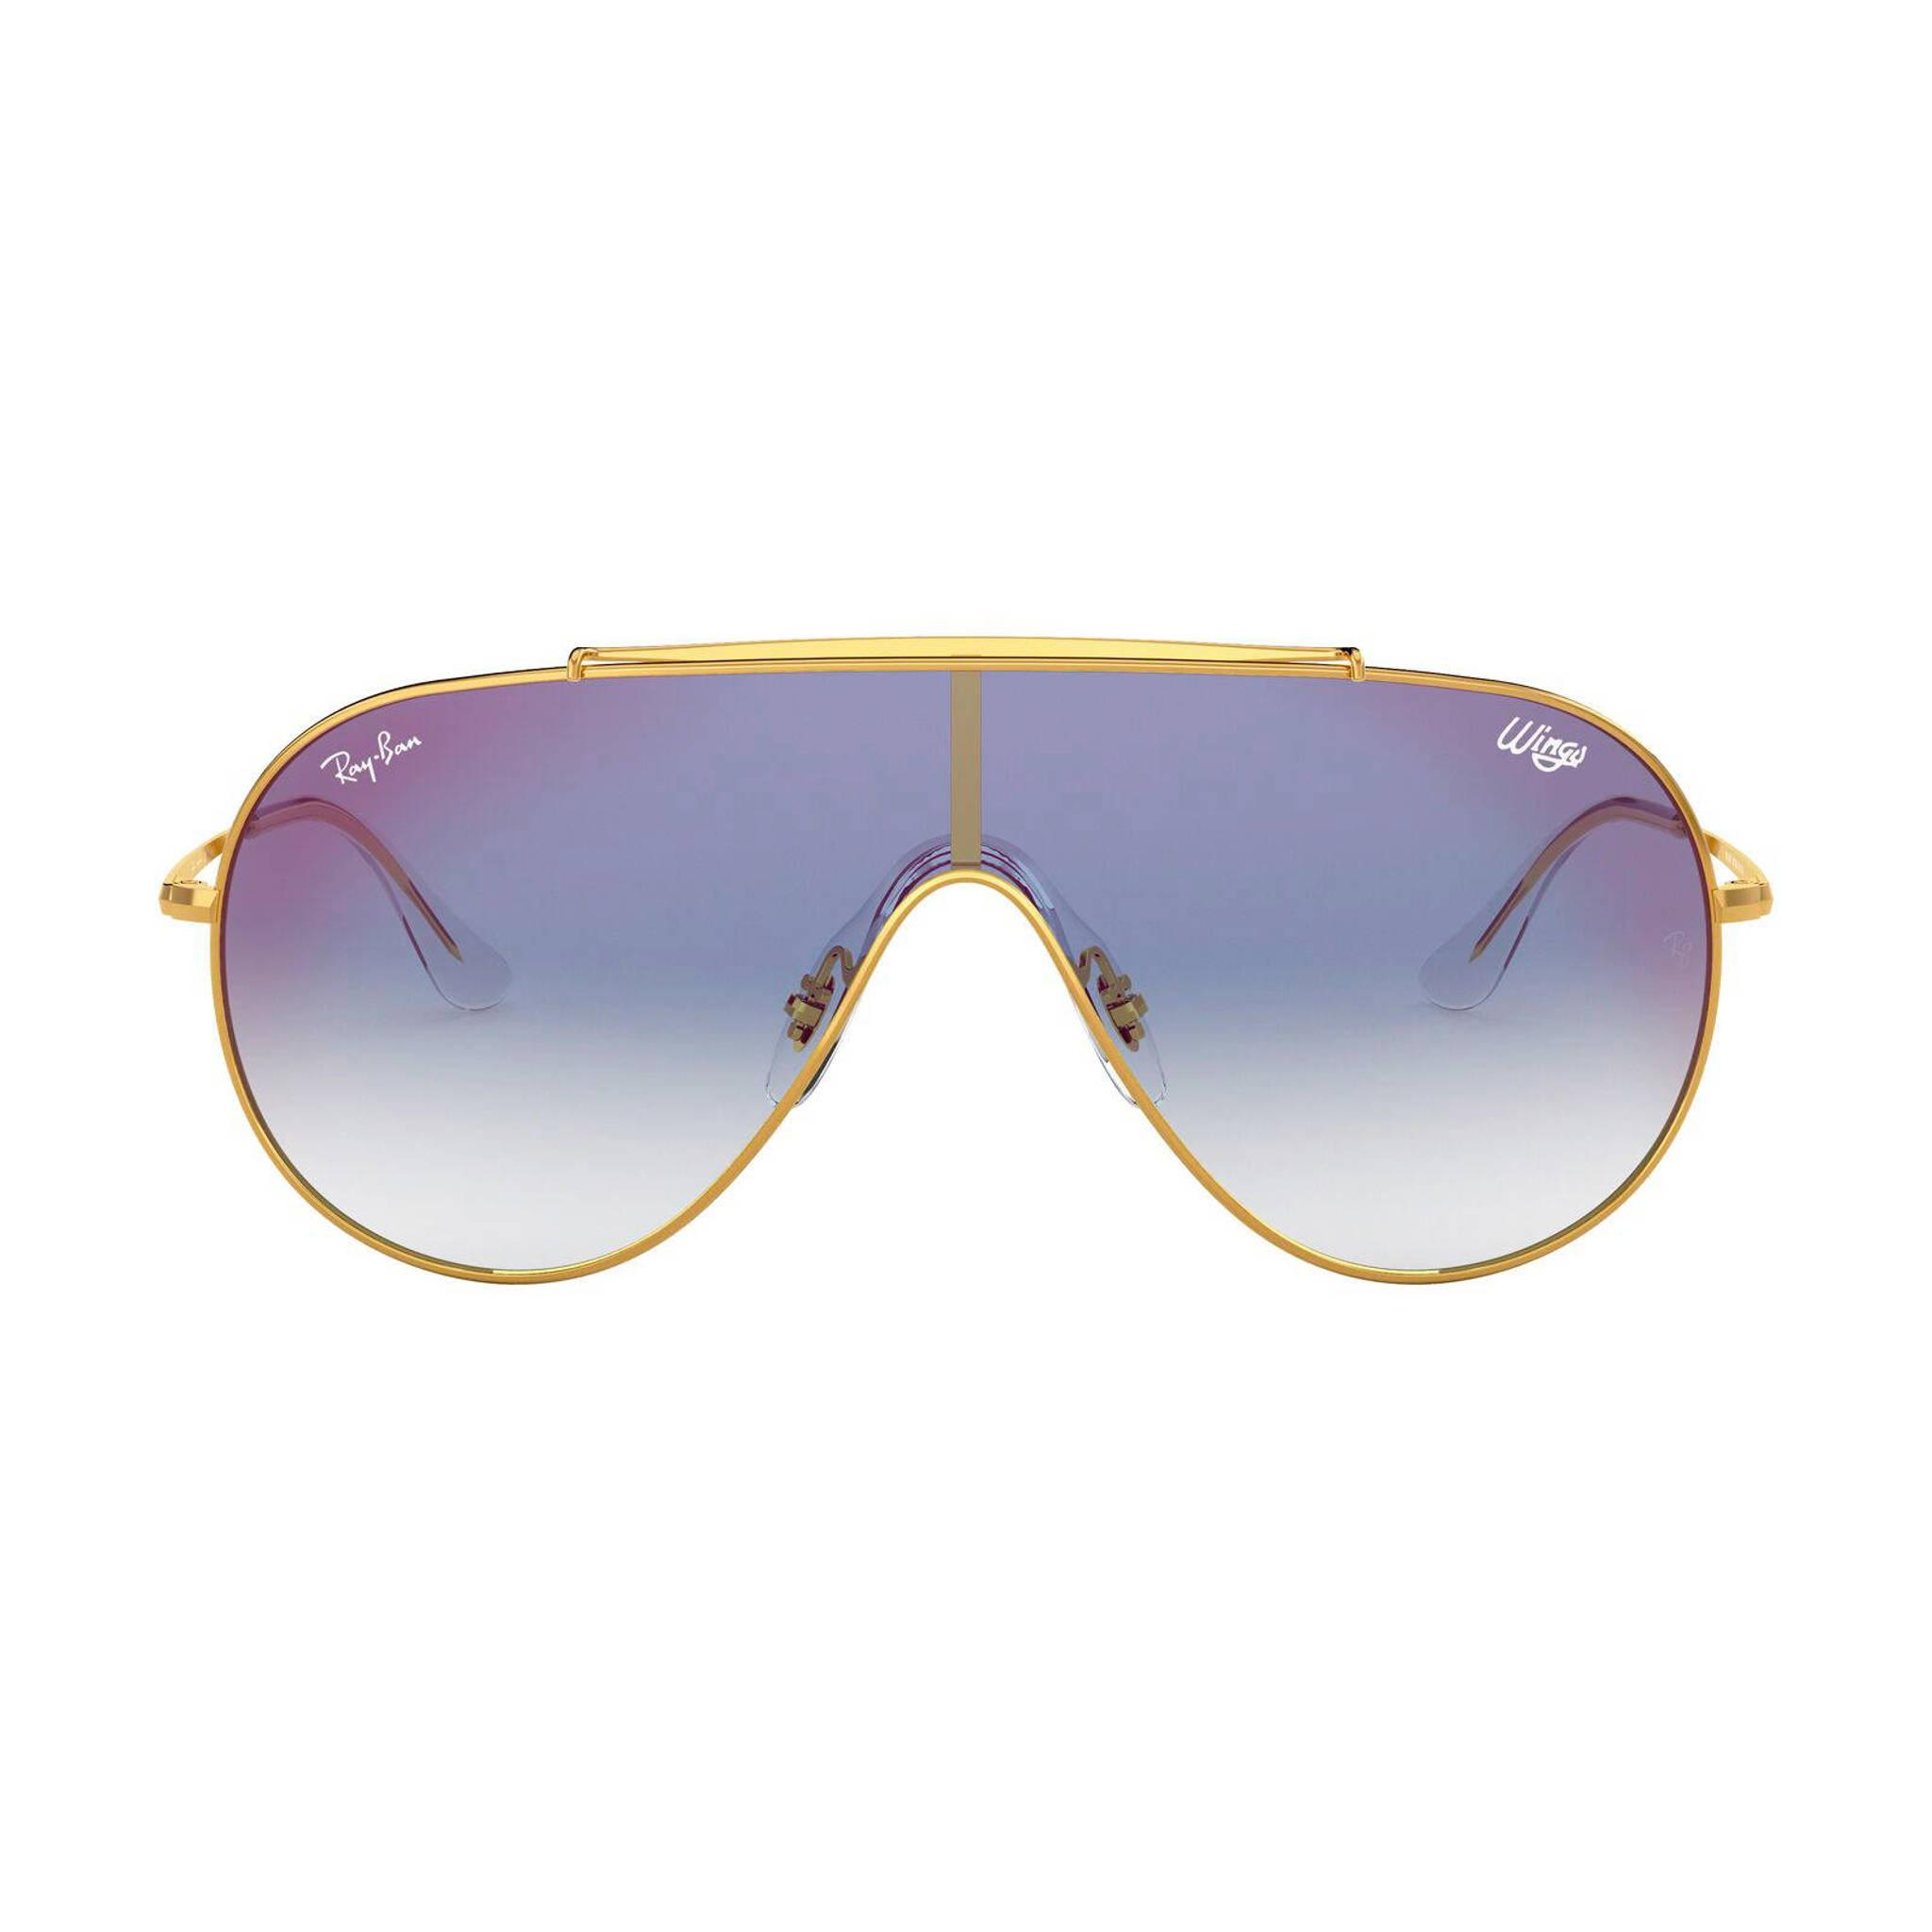 5e5c14d4b330d5 Ray-Ban zonnebril 0RB3597